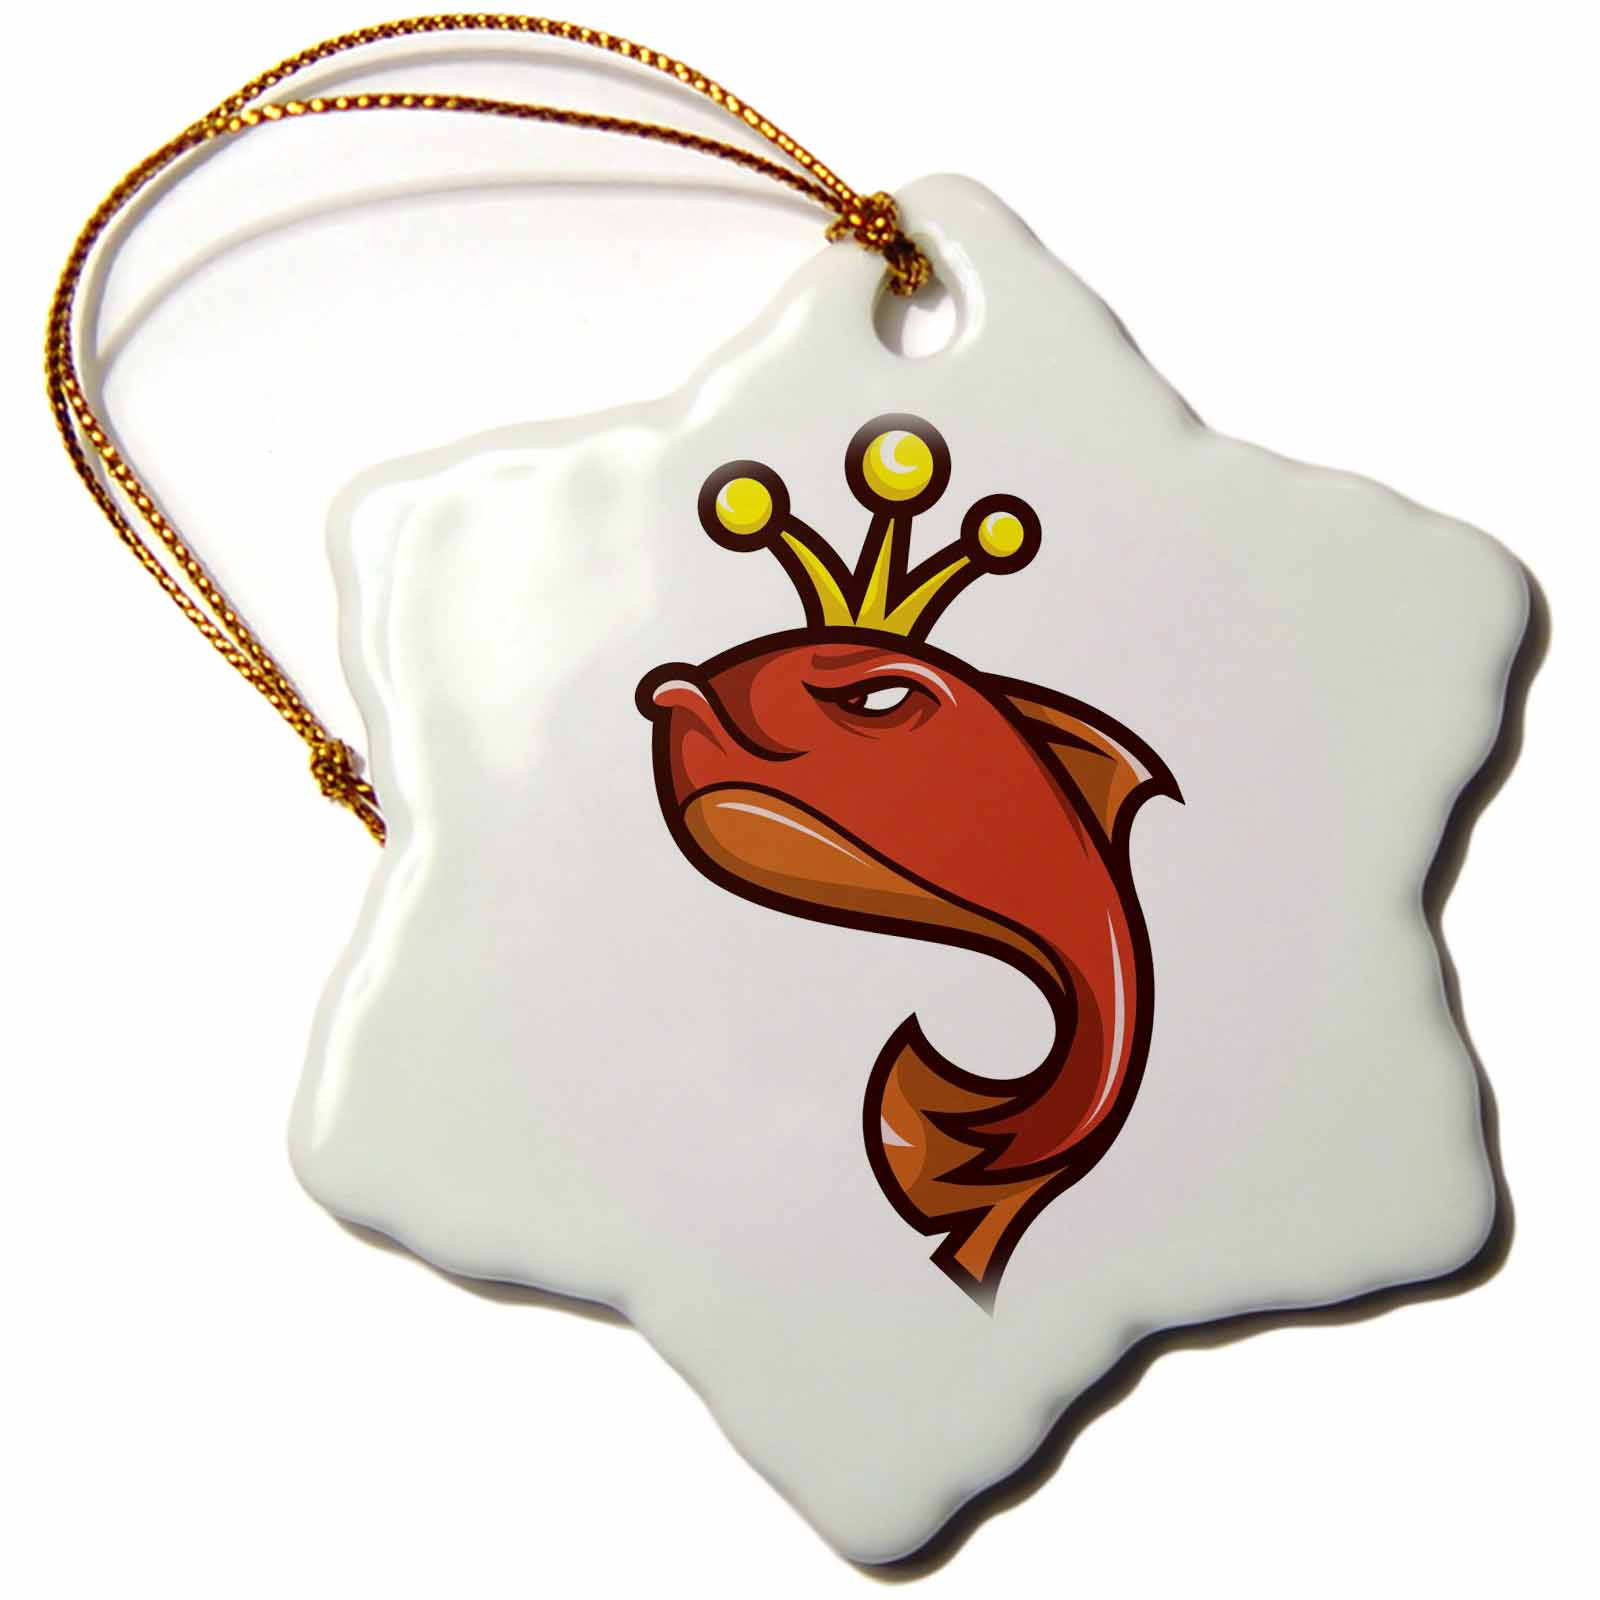 3dRose King Fish, Snowflake Ornament, Porcelain, 3-inch